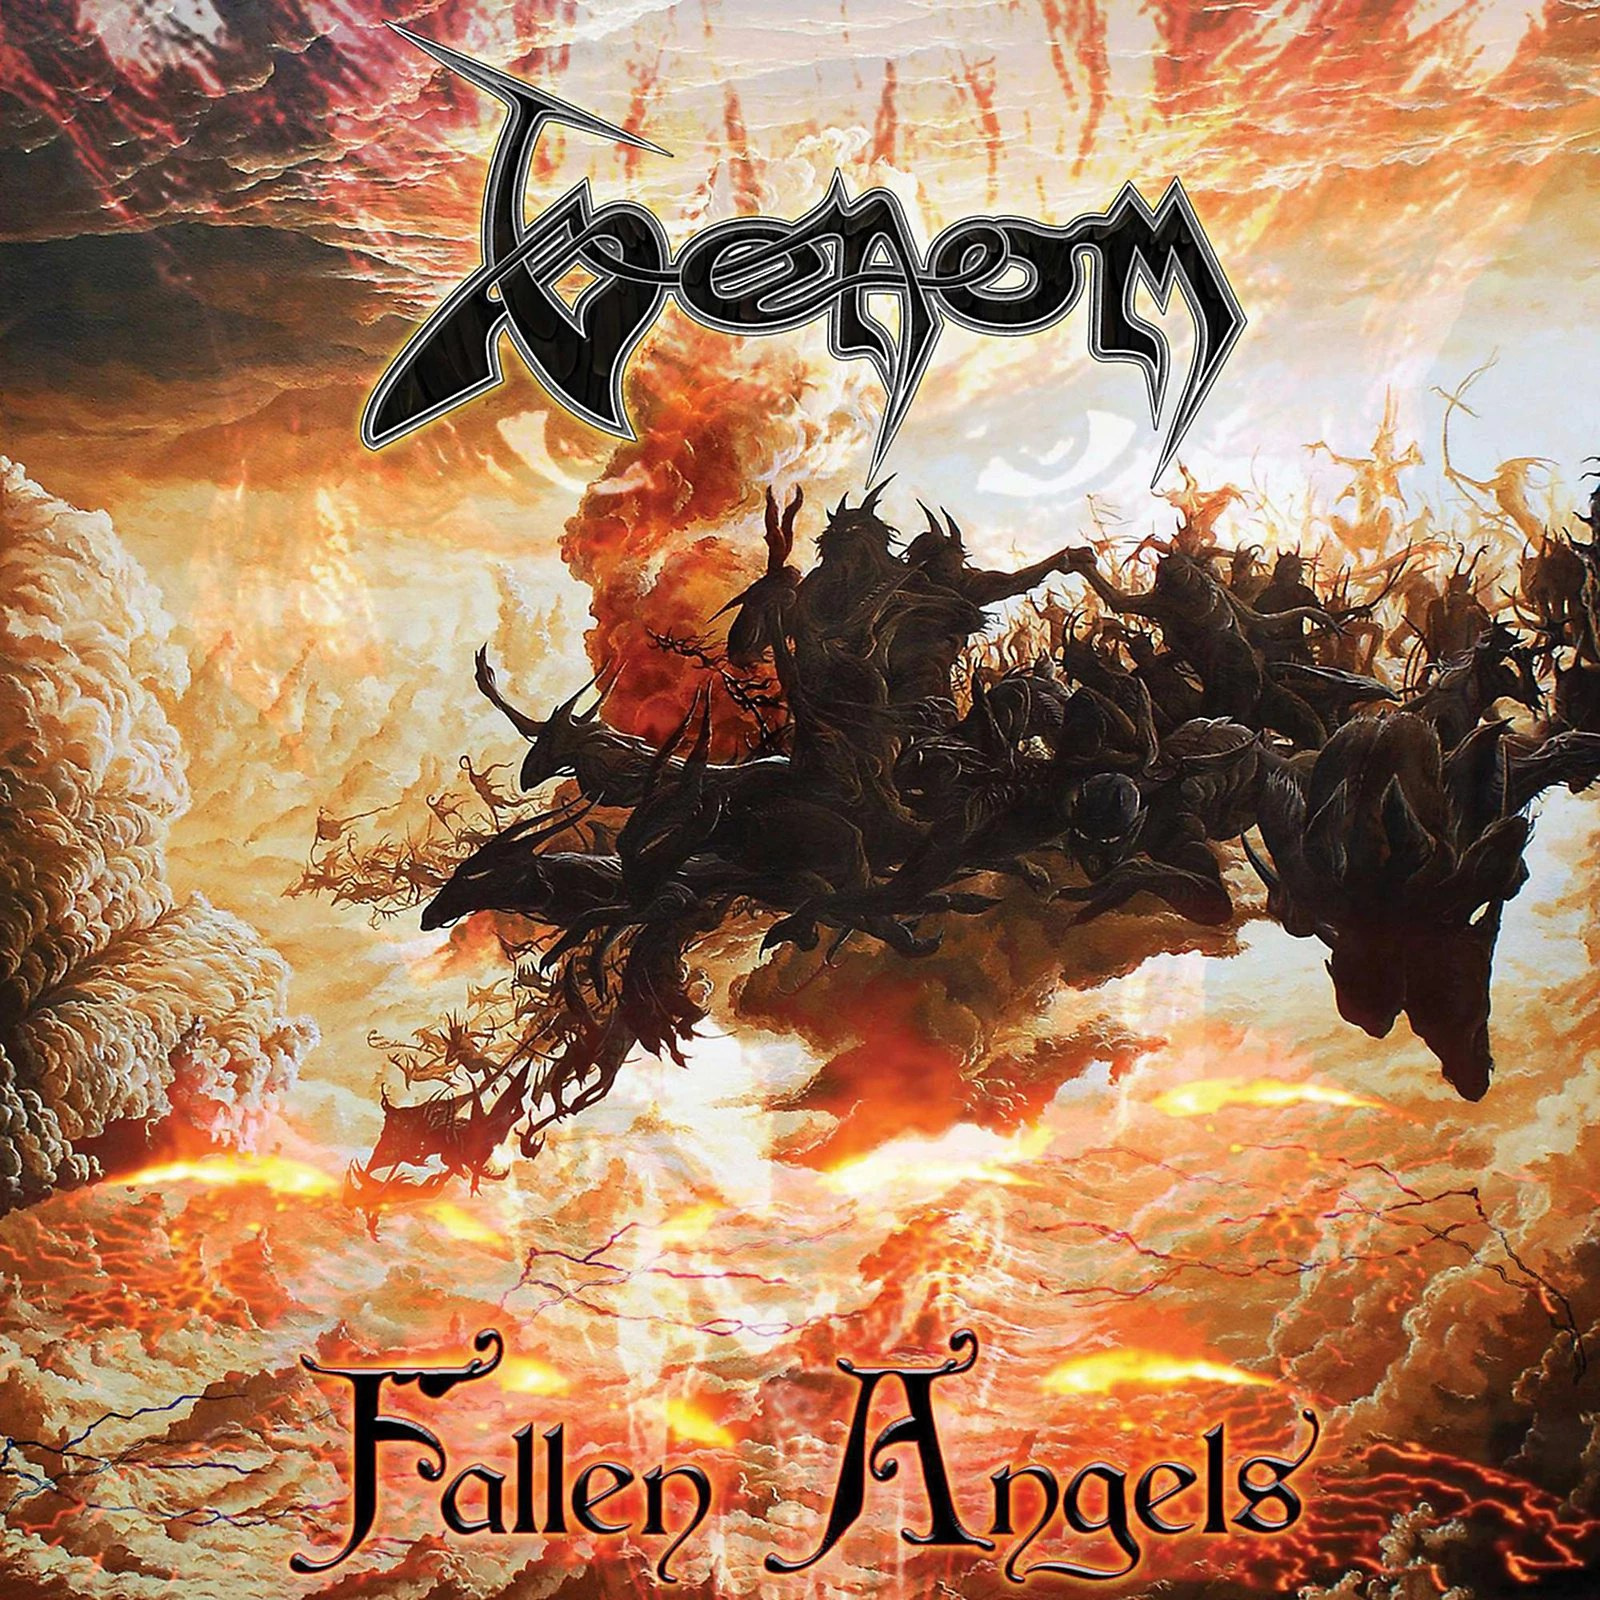 Reviews for Venom - Fallen Angels